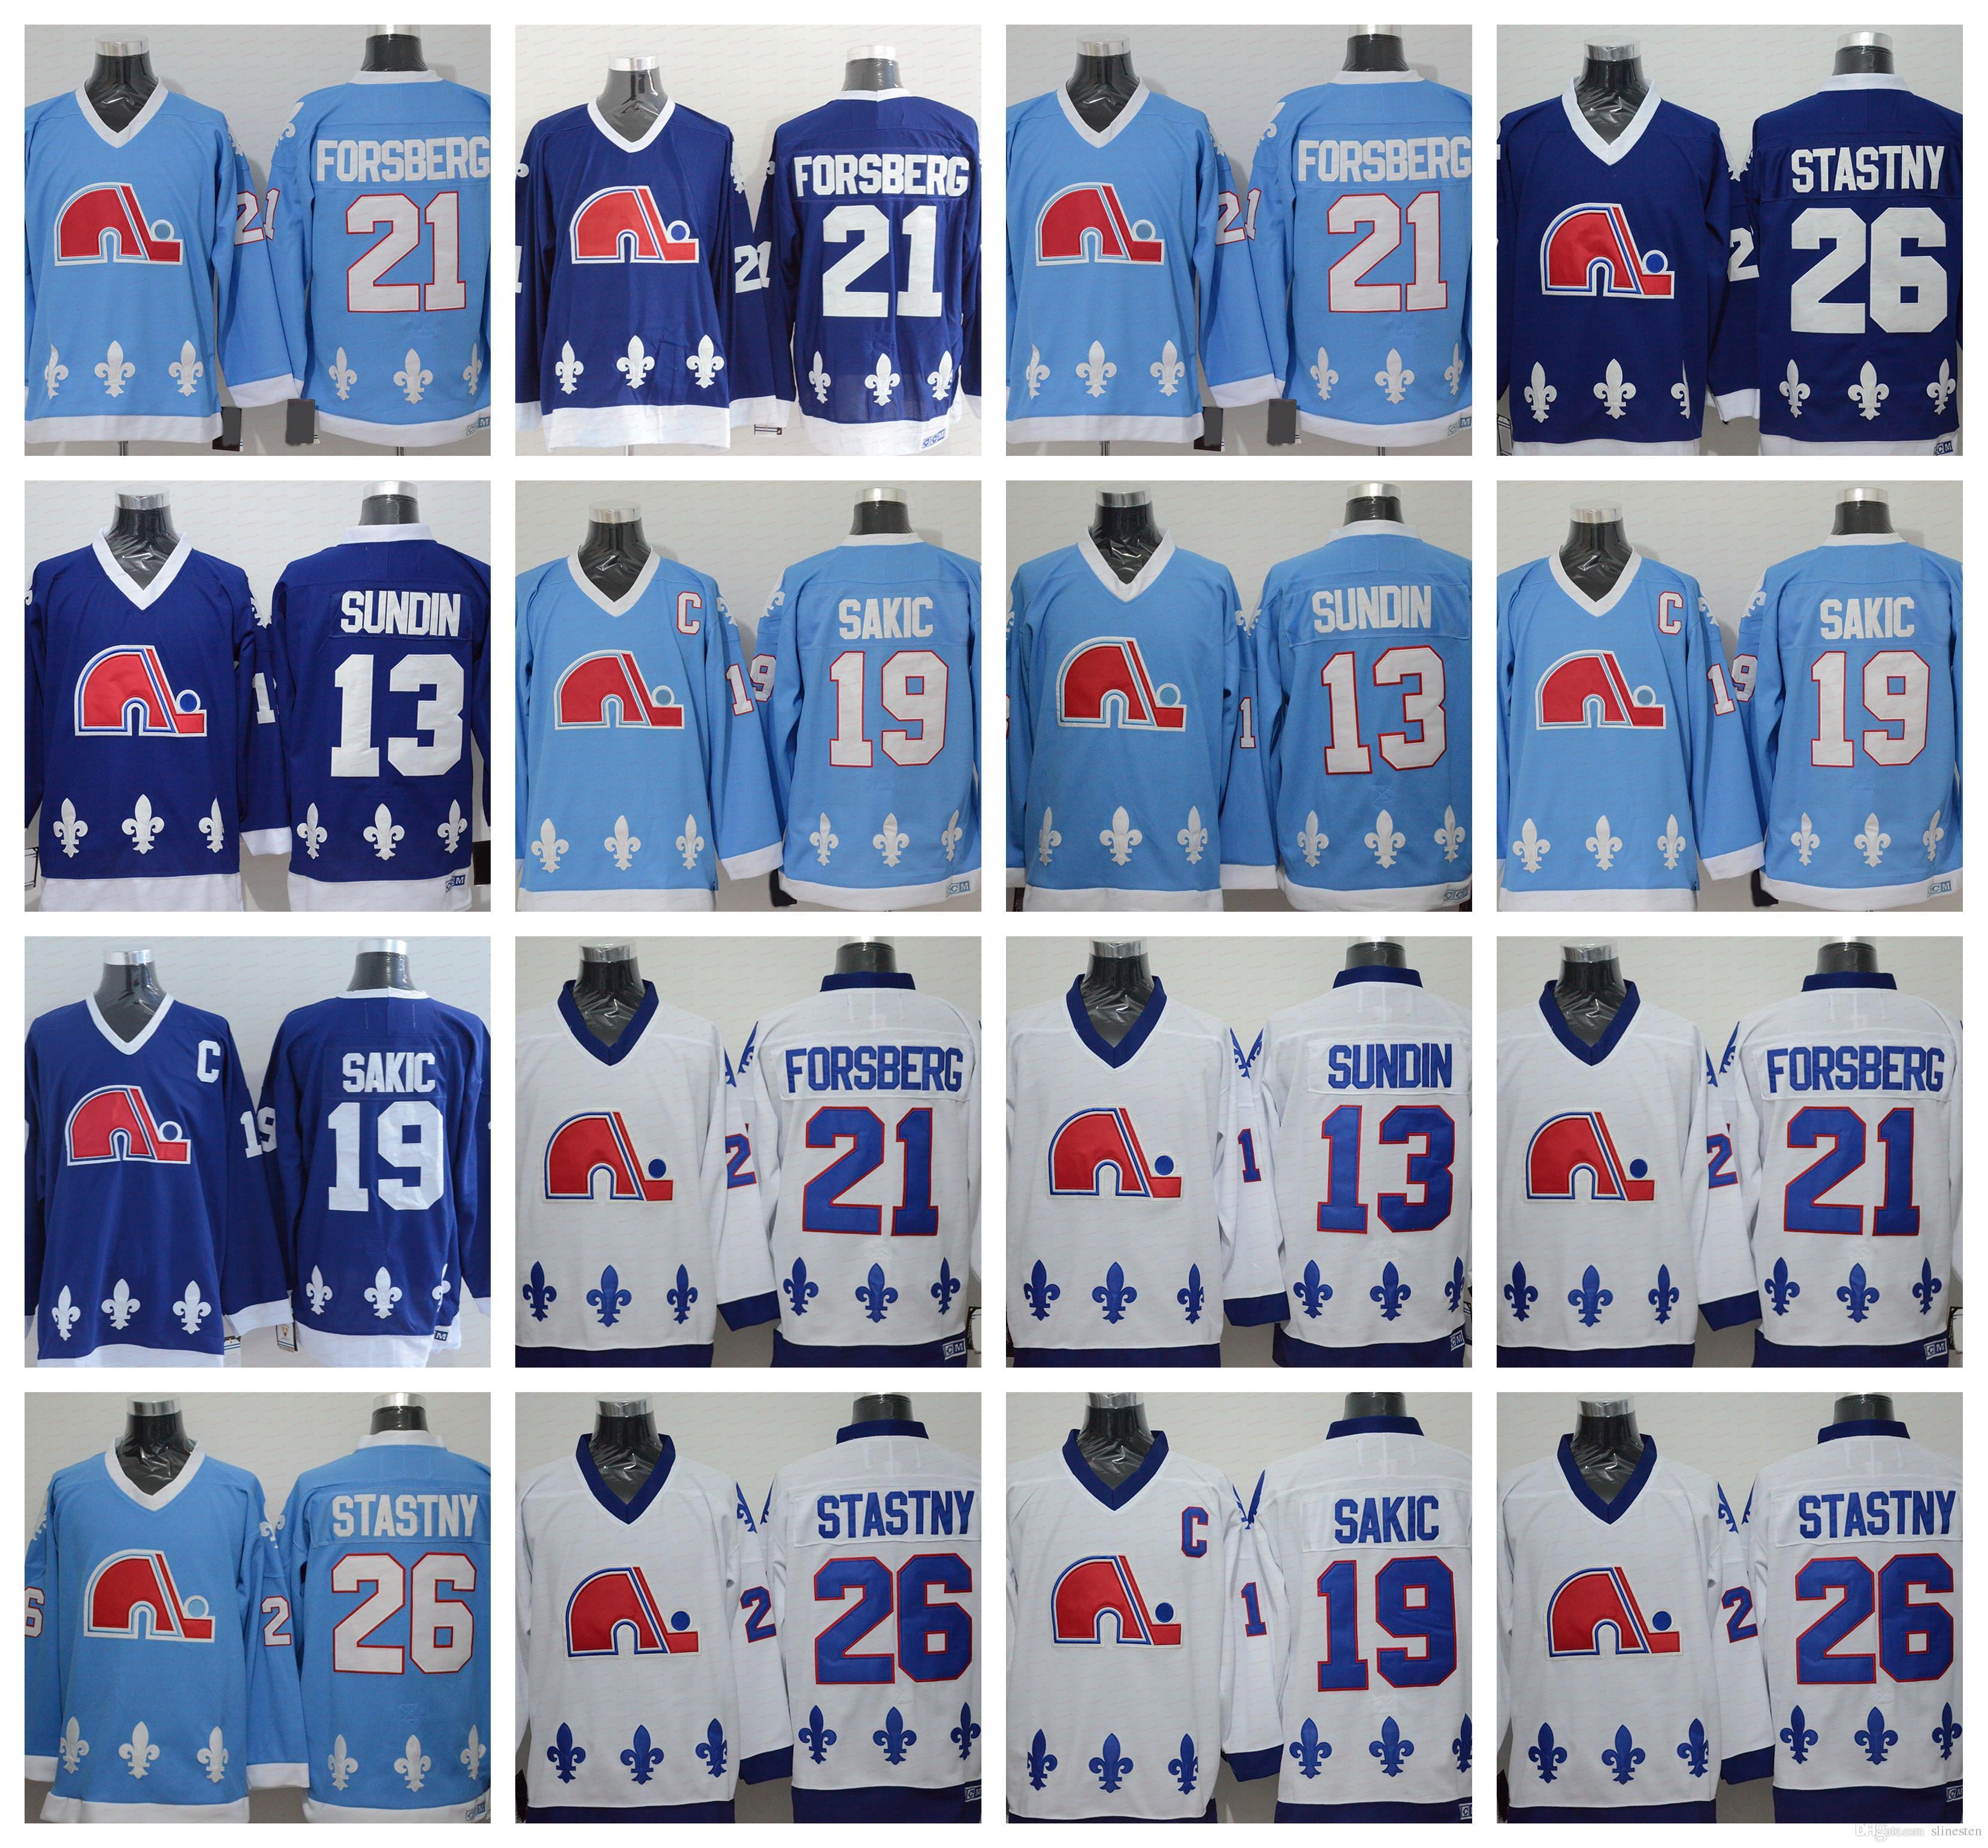 2019 CCM Quebec Nordiques Jerseys Ice Hockey 13 Mats Sundin 21 Peter  Forsberg 26 Peter Stastny 19 Joe Sakic Team Color Navy Blue White From  Slinesten 681e7a033